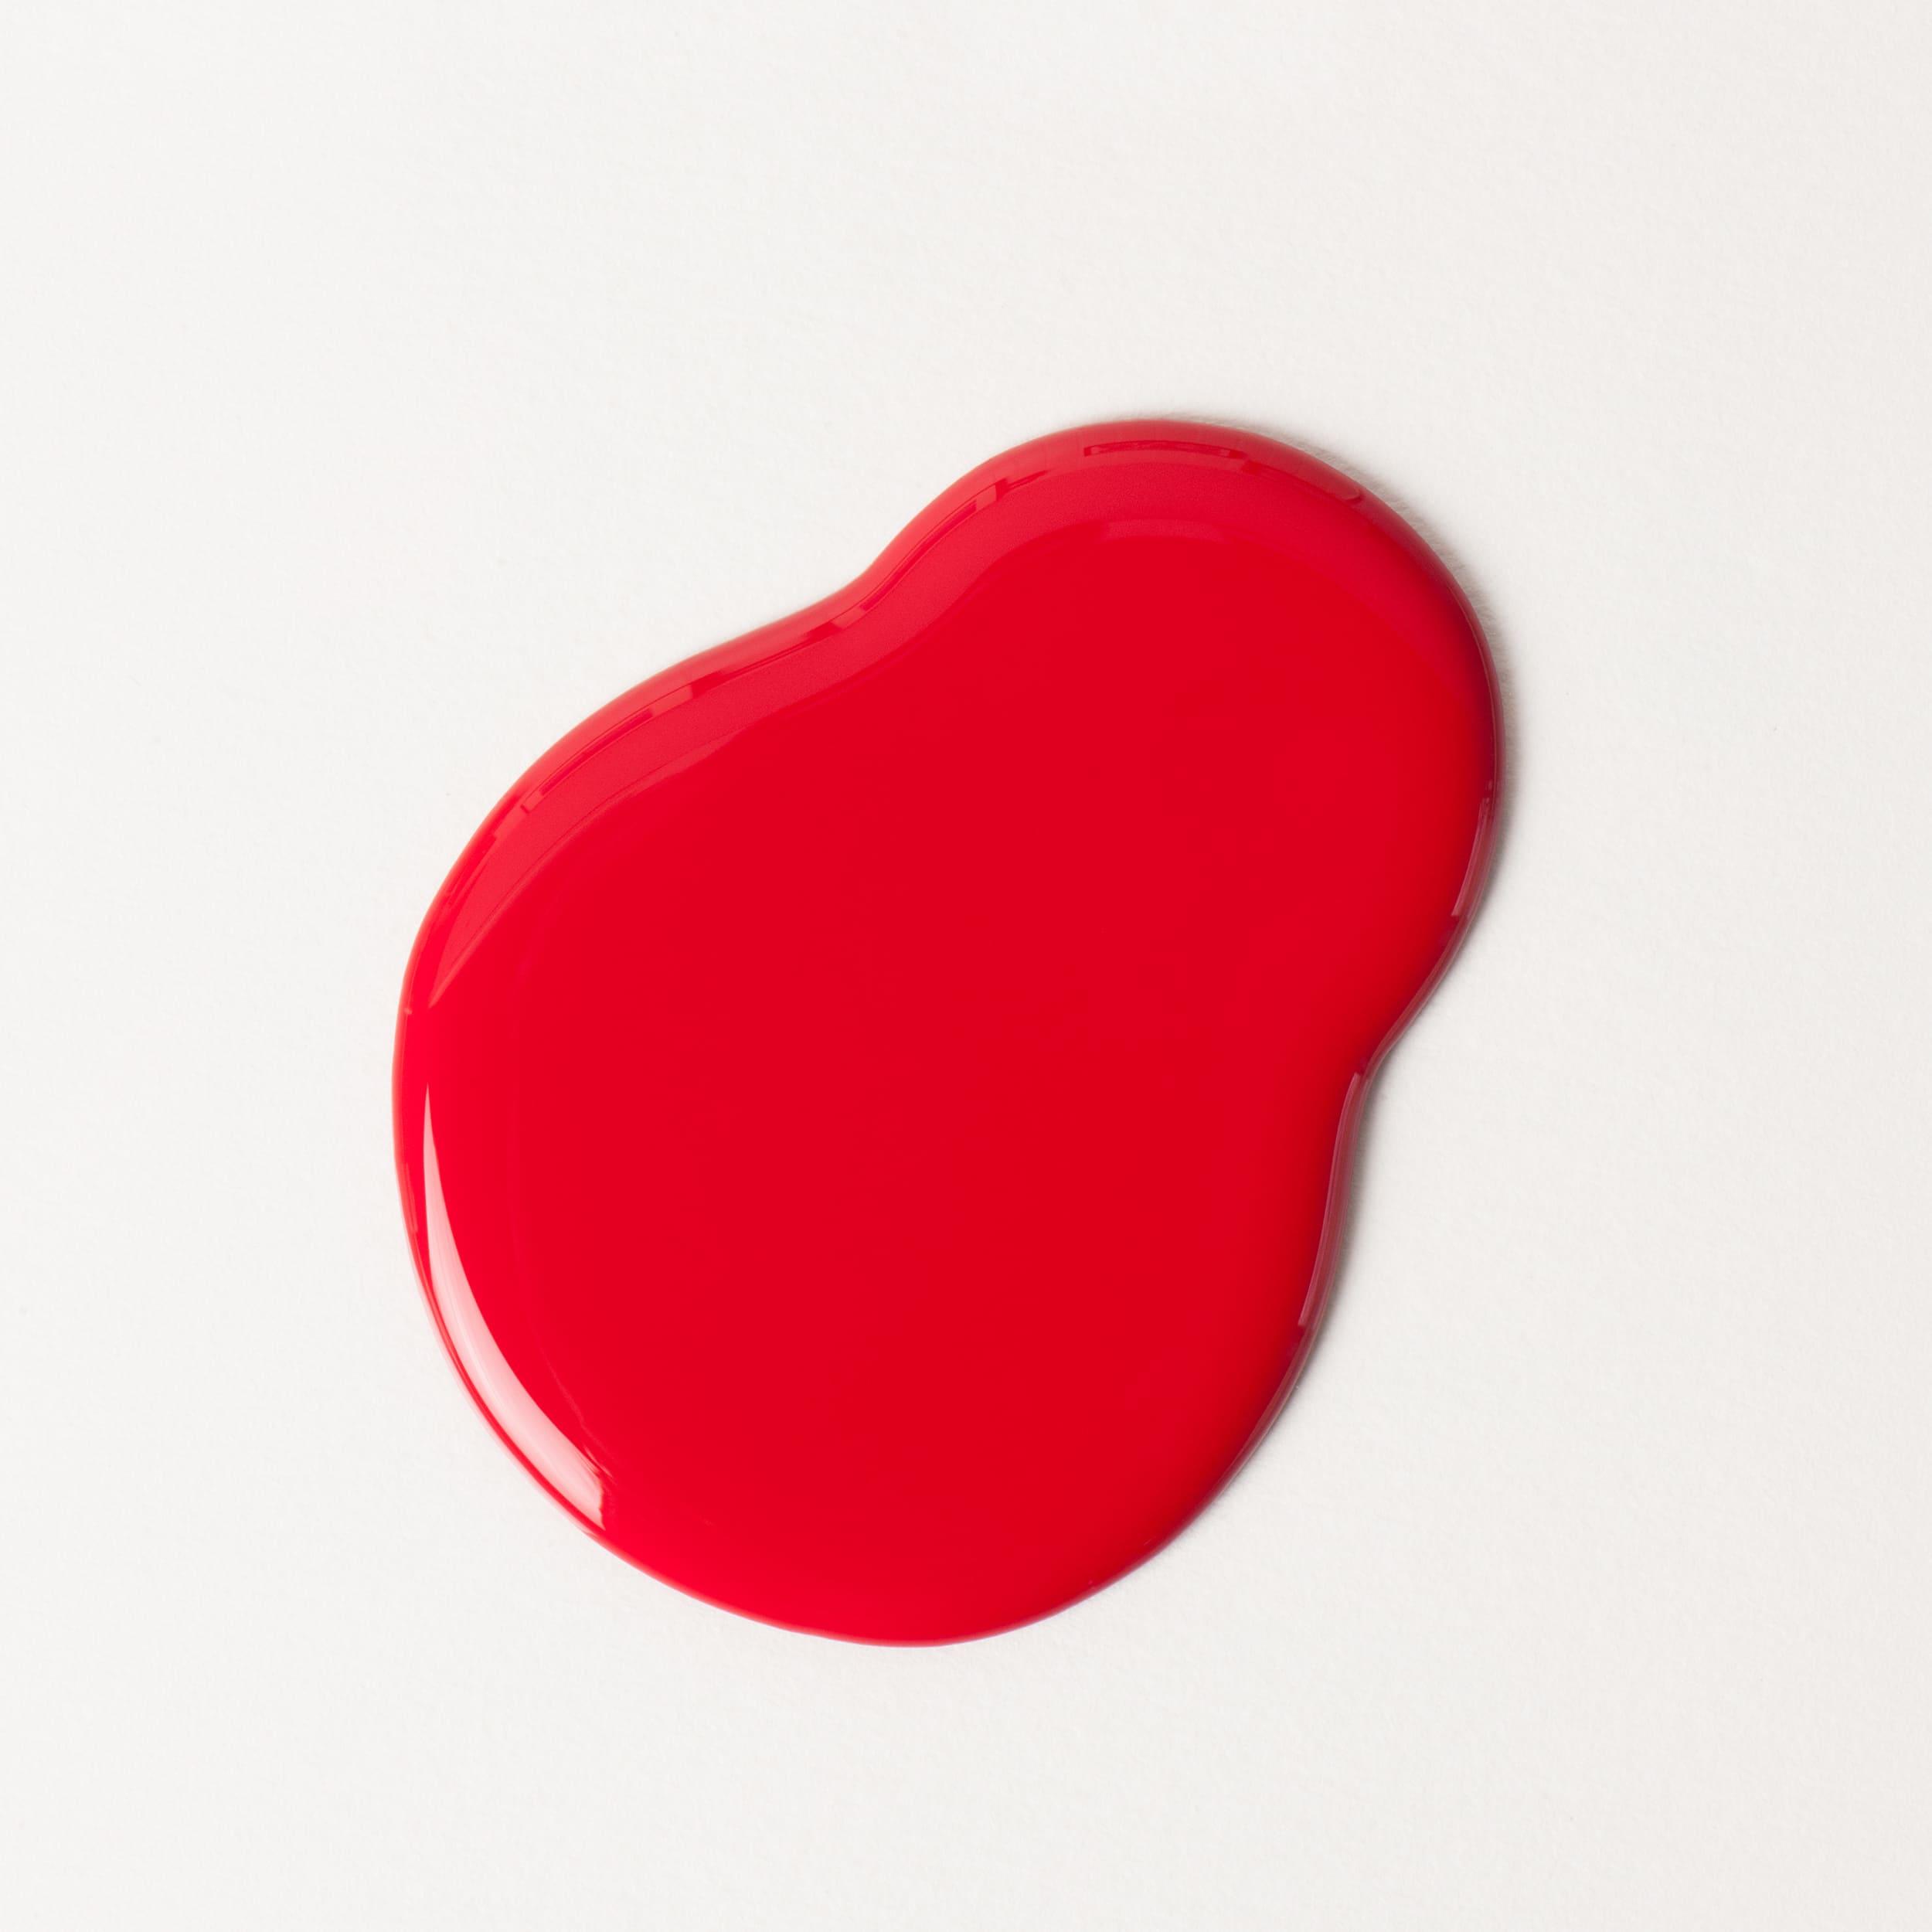 Le rouge à ongles - vernis - 5